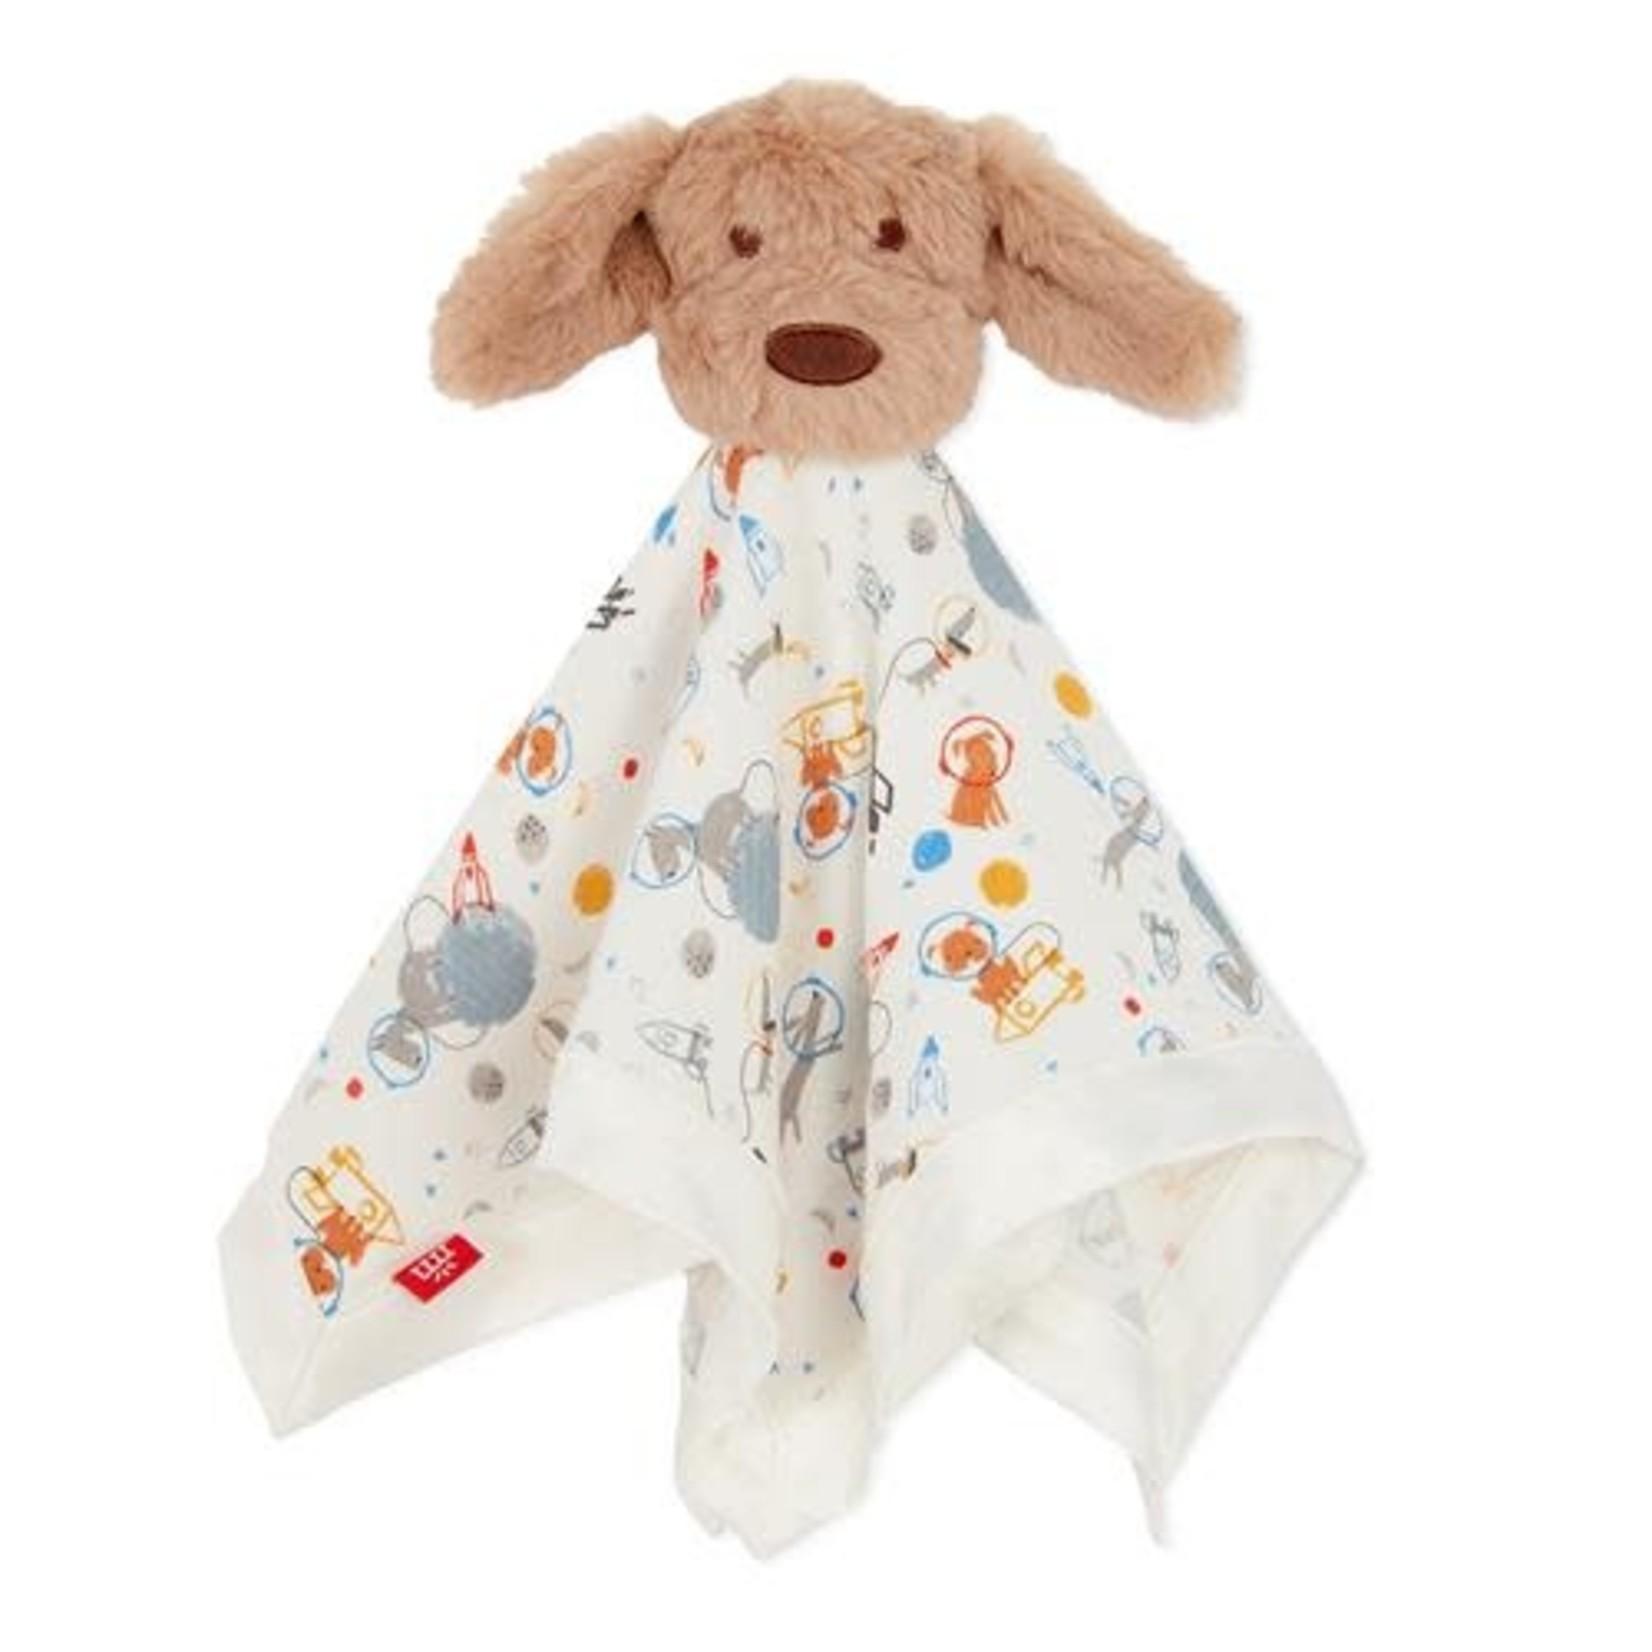 Magnetic Me Astro Pups Modal Lovey Blanket